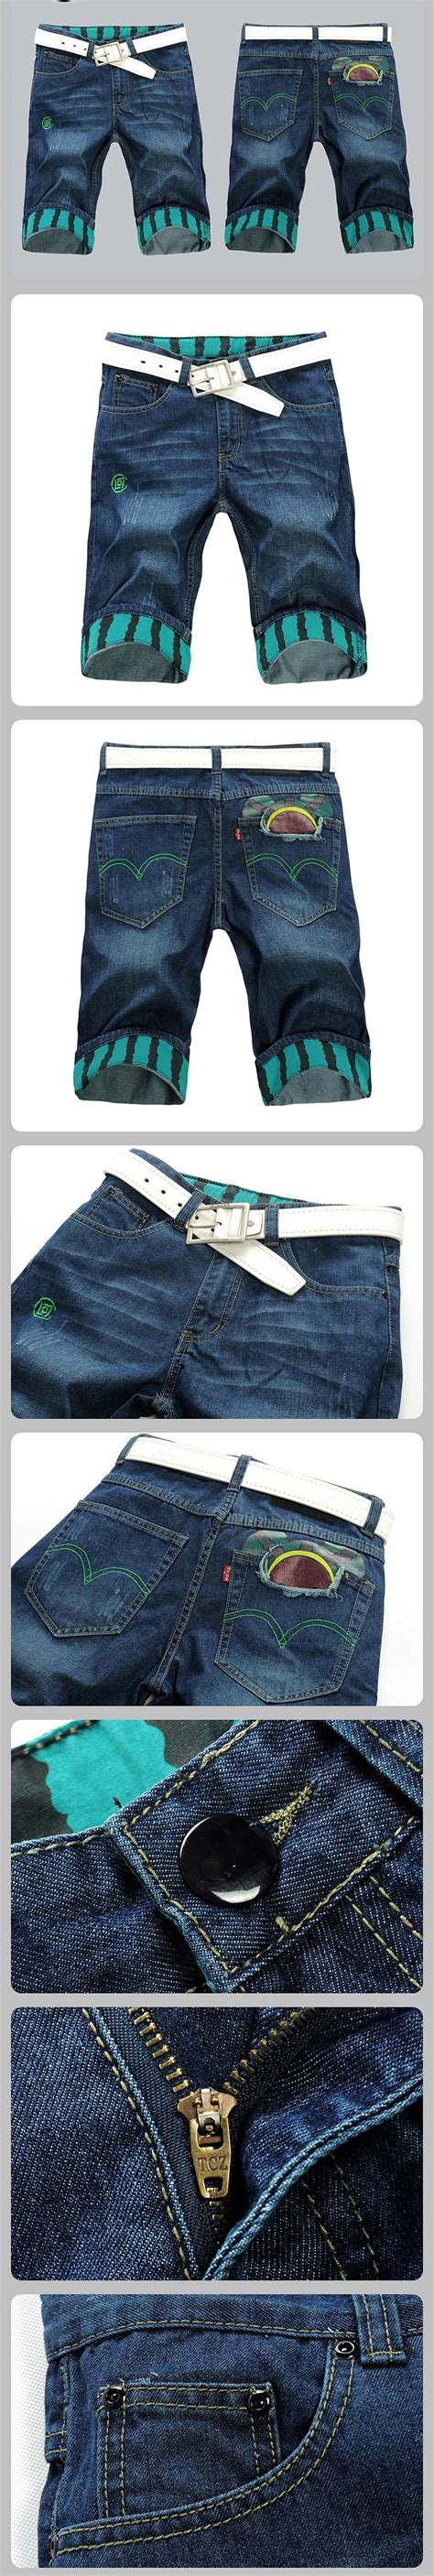 Celana Bahan Semi Woll Slimfit celana pria slim fit cp051 darwismarket